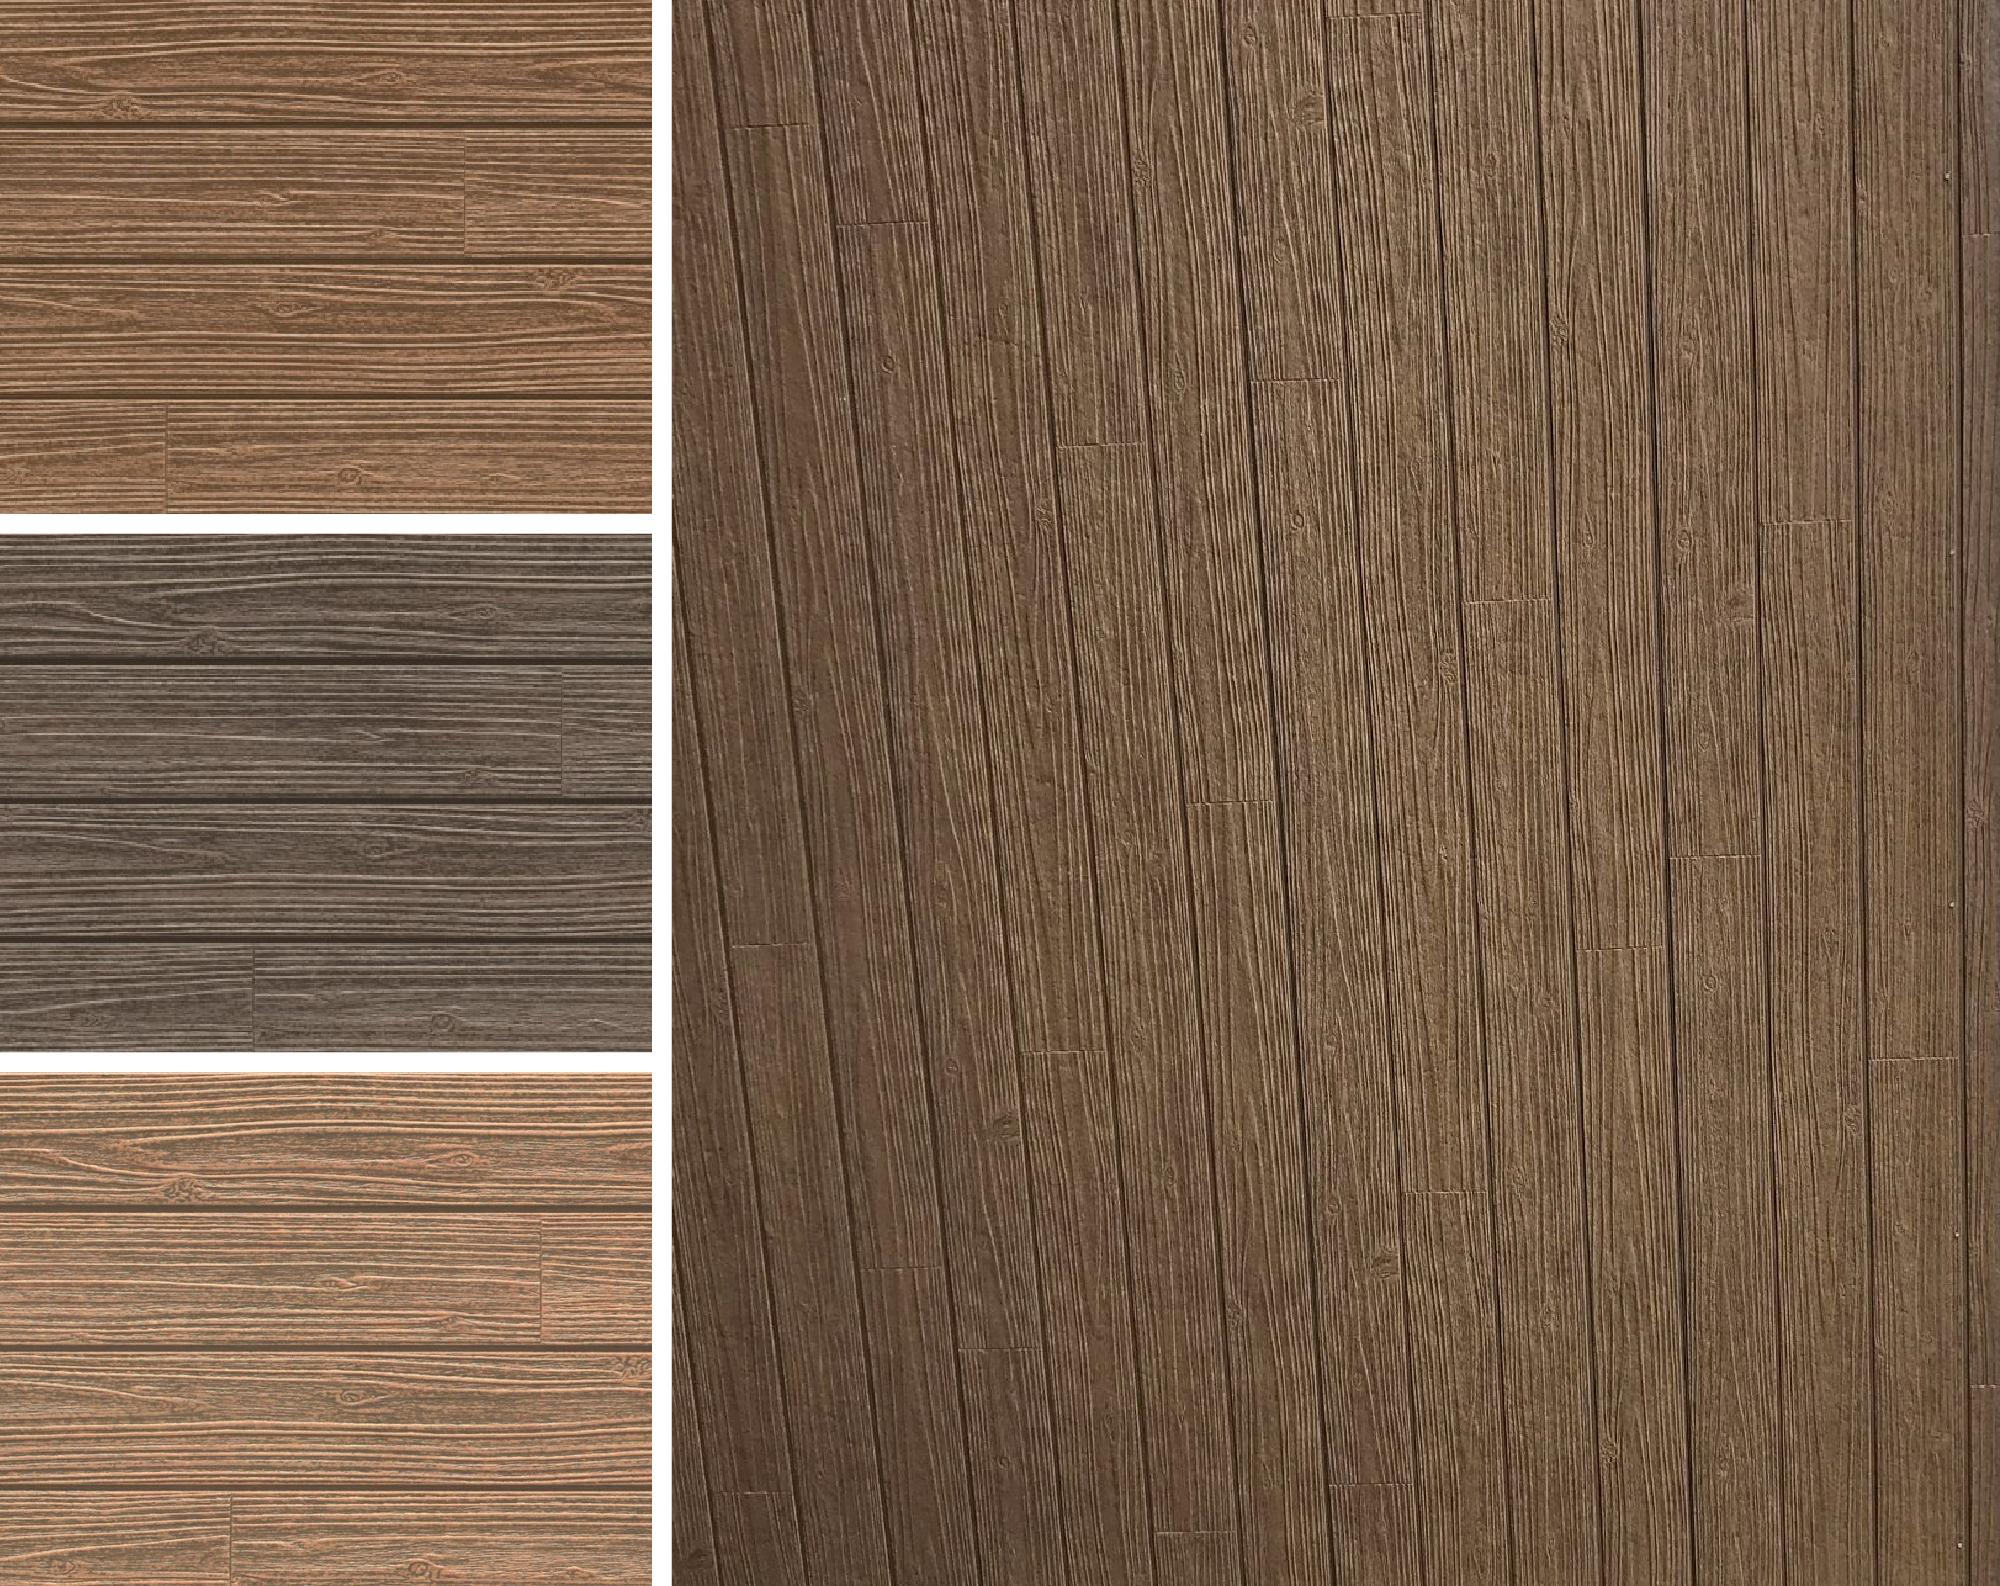 CERACLAD Rustic Wood Fiber Cement Facades